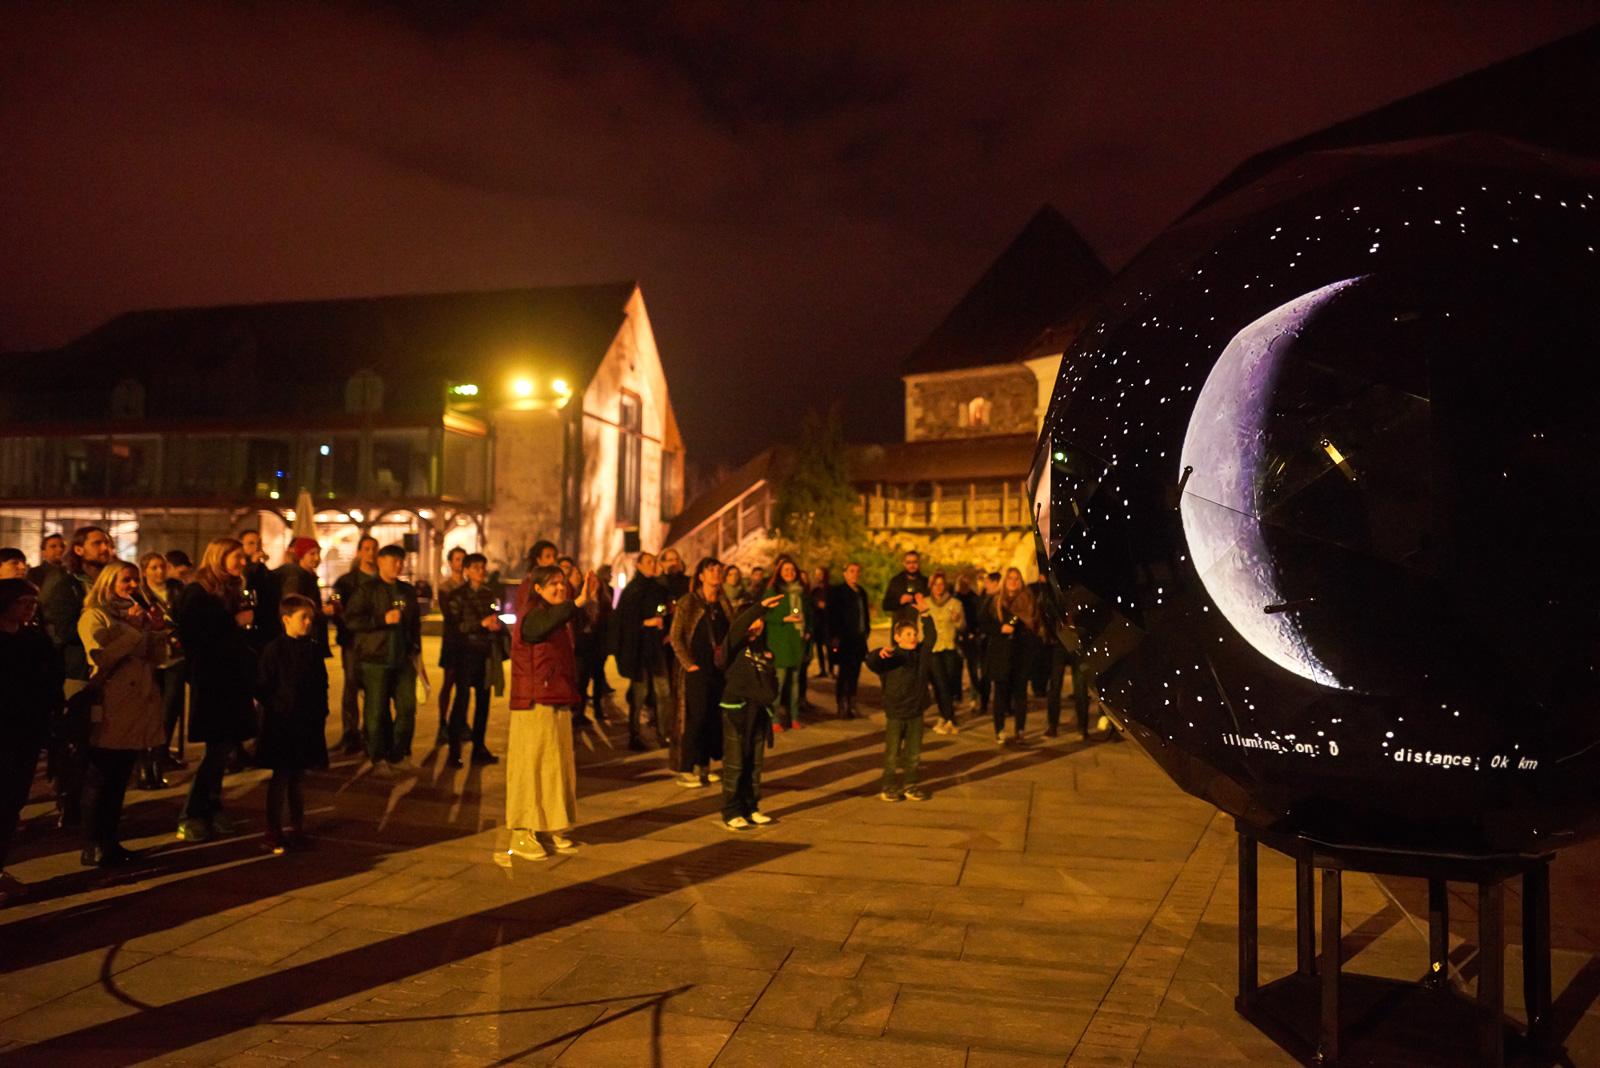 moonolith, un monumento interactivo